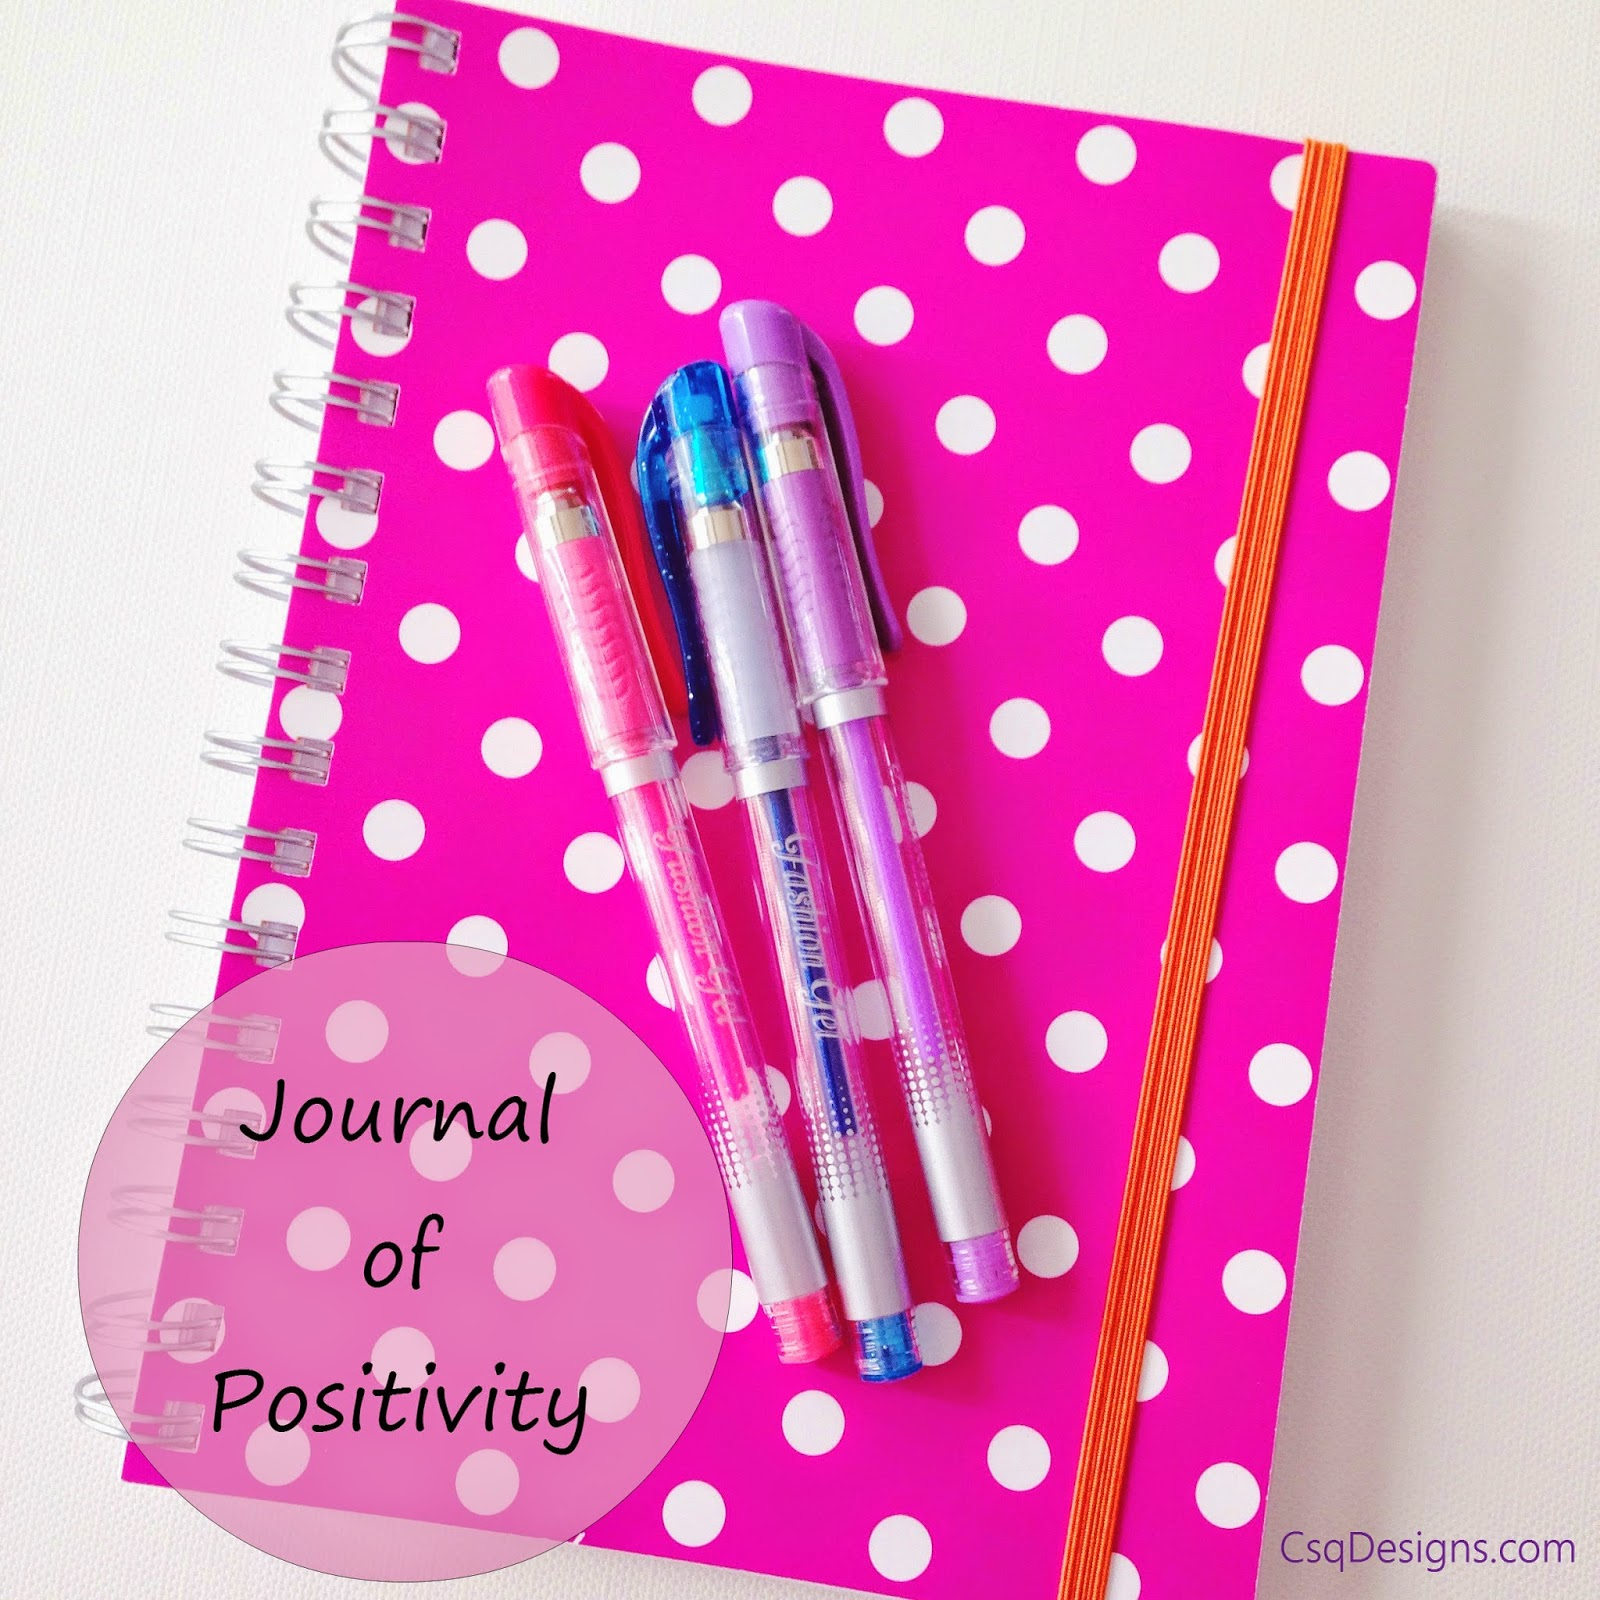 Journal of Positivity